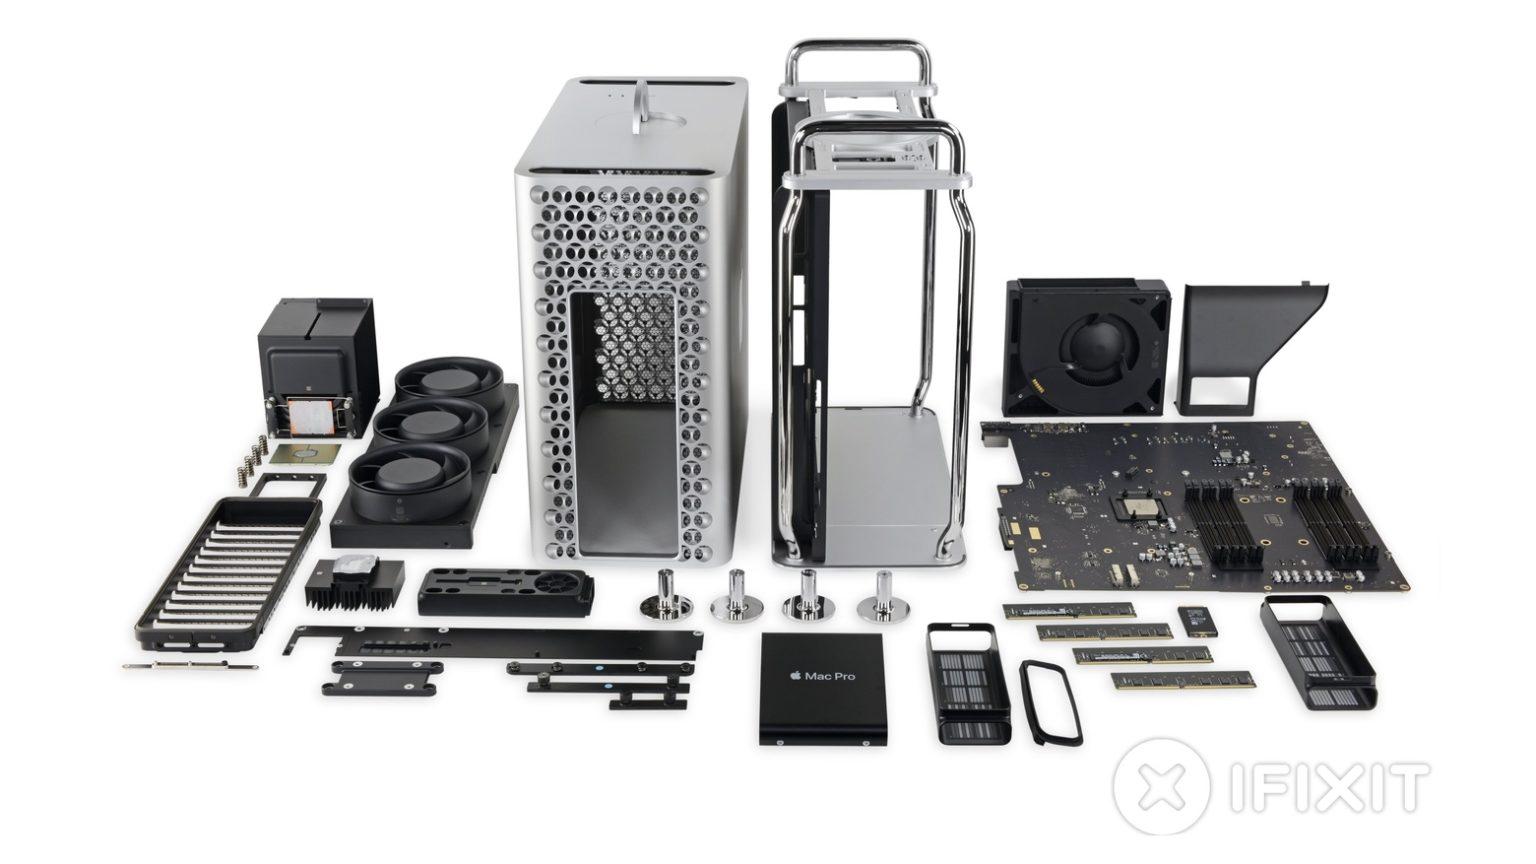 A 2019 Mac Pro after an iFixit tear down